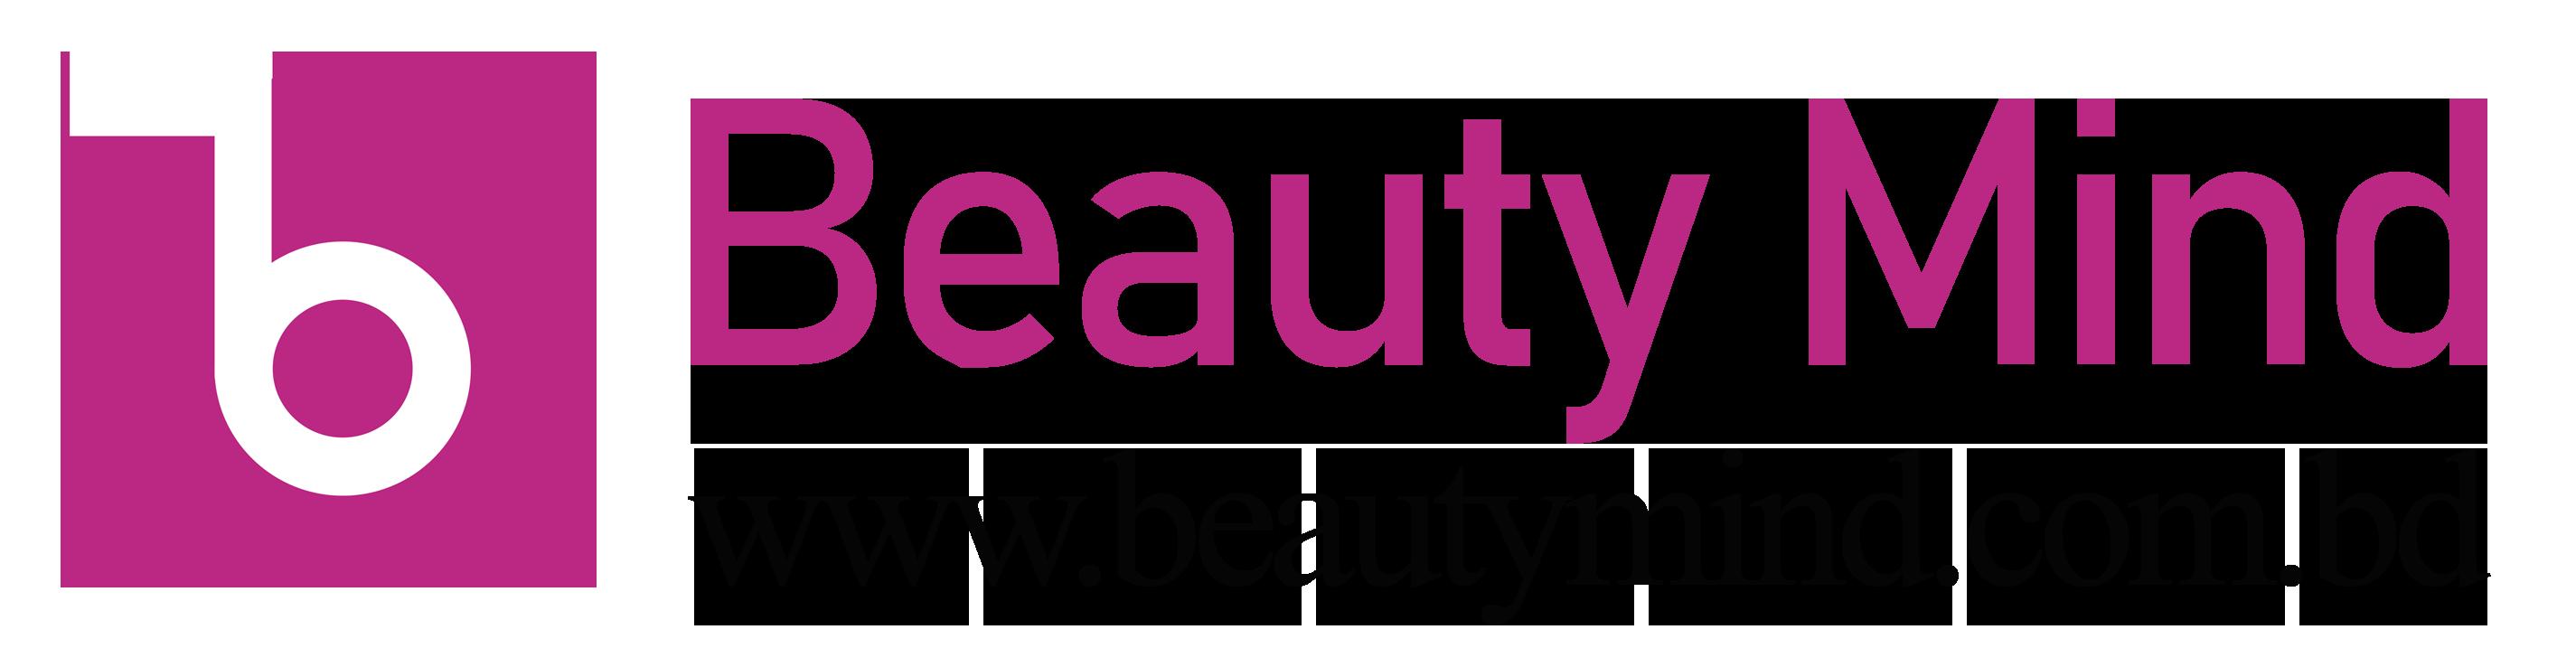 Beauty Mind ll Beauty & Cosmetics Store in Bangladesh